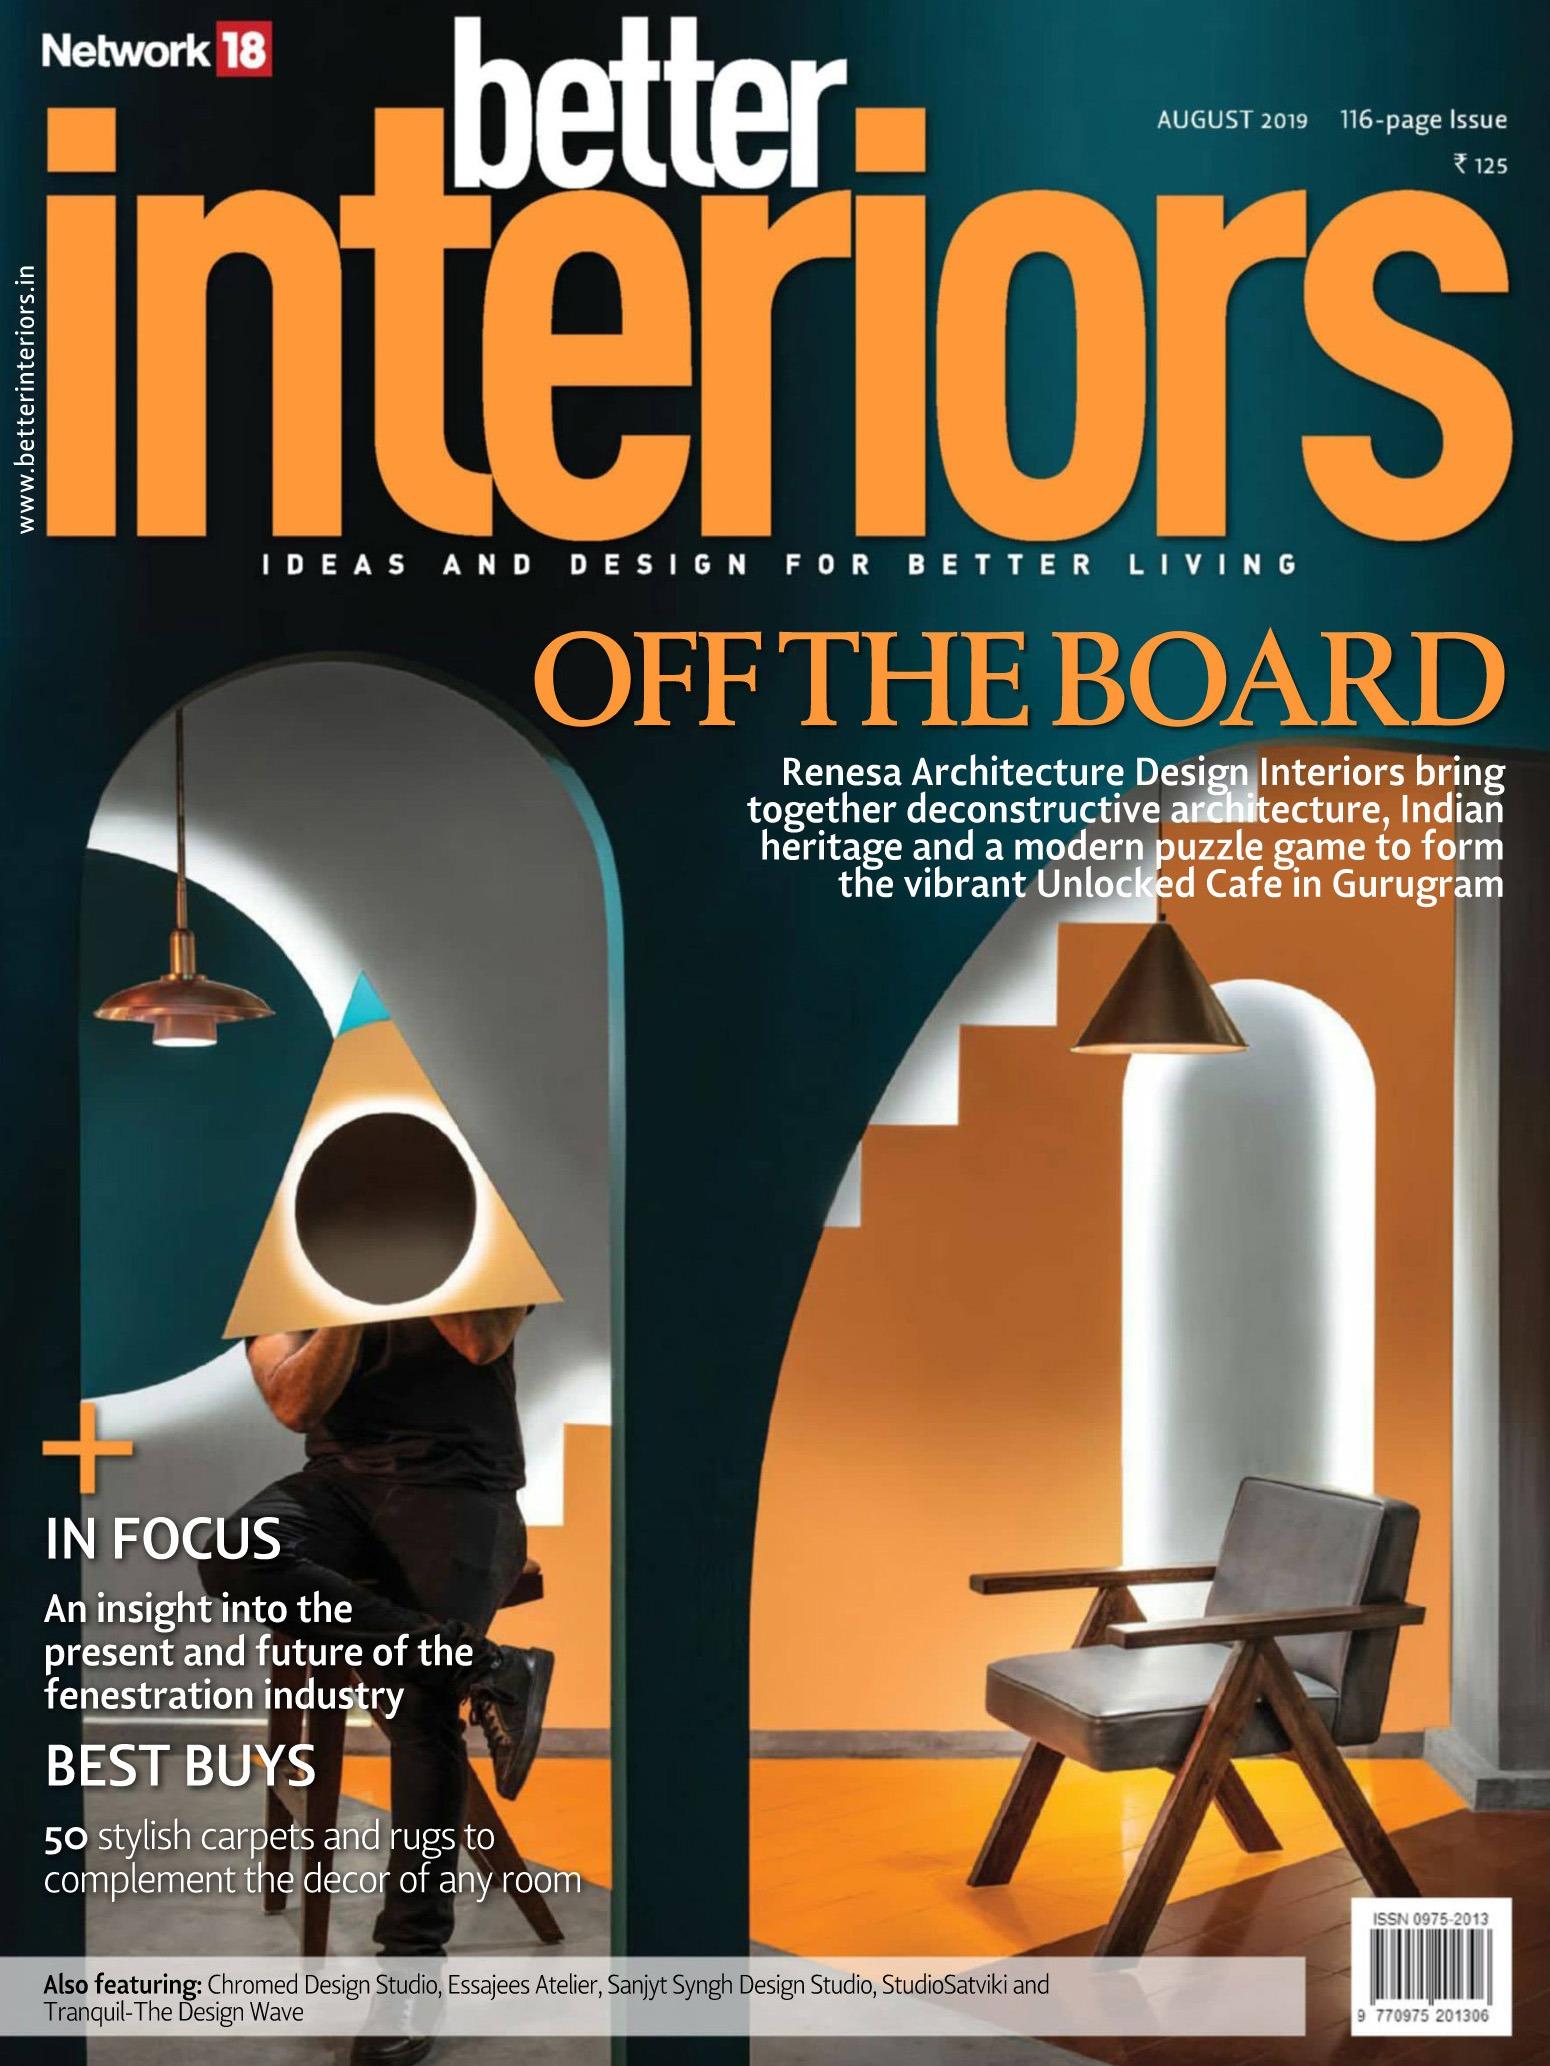 《Better Interiors》印度版时尚家居杂志2019年08月号